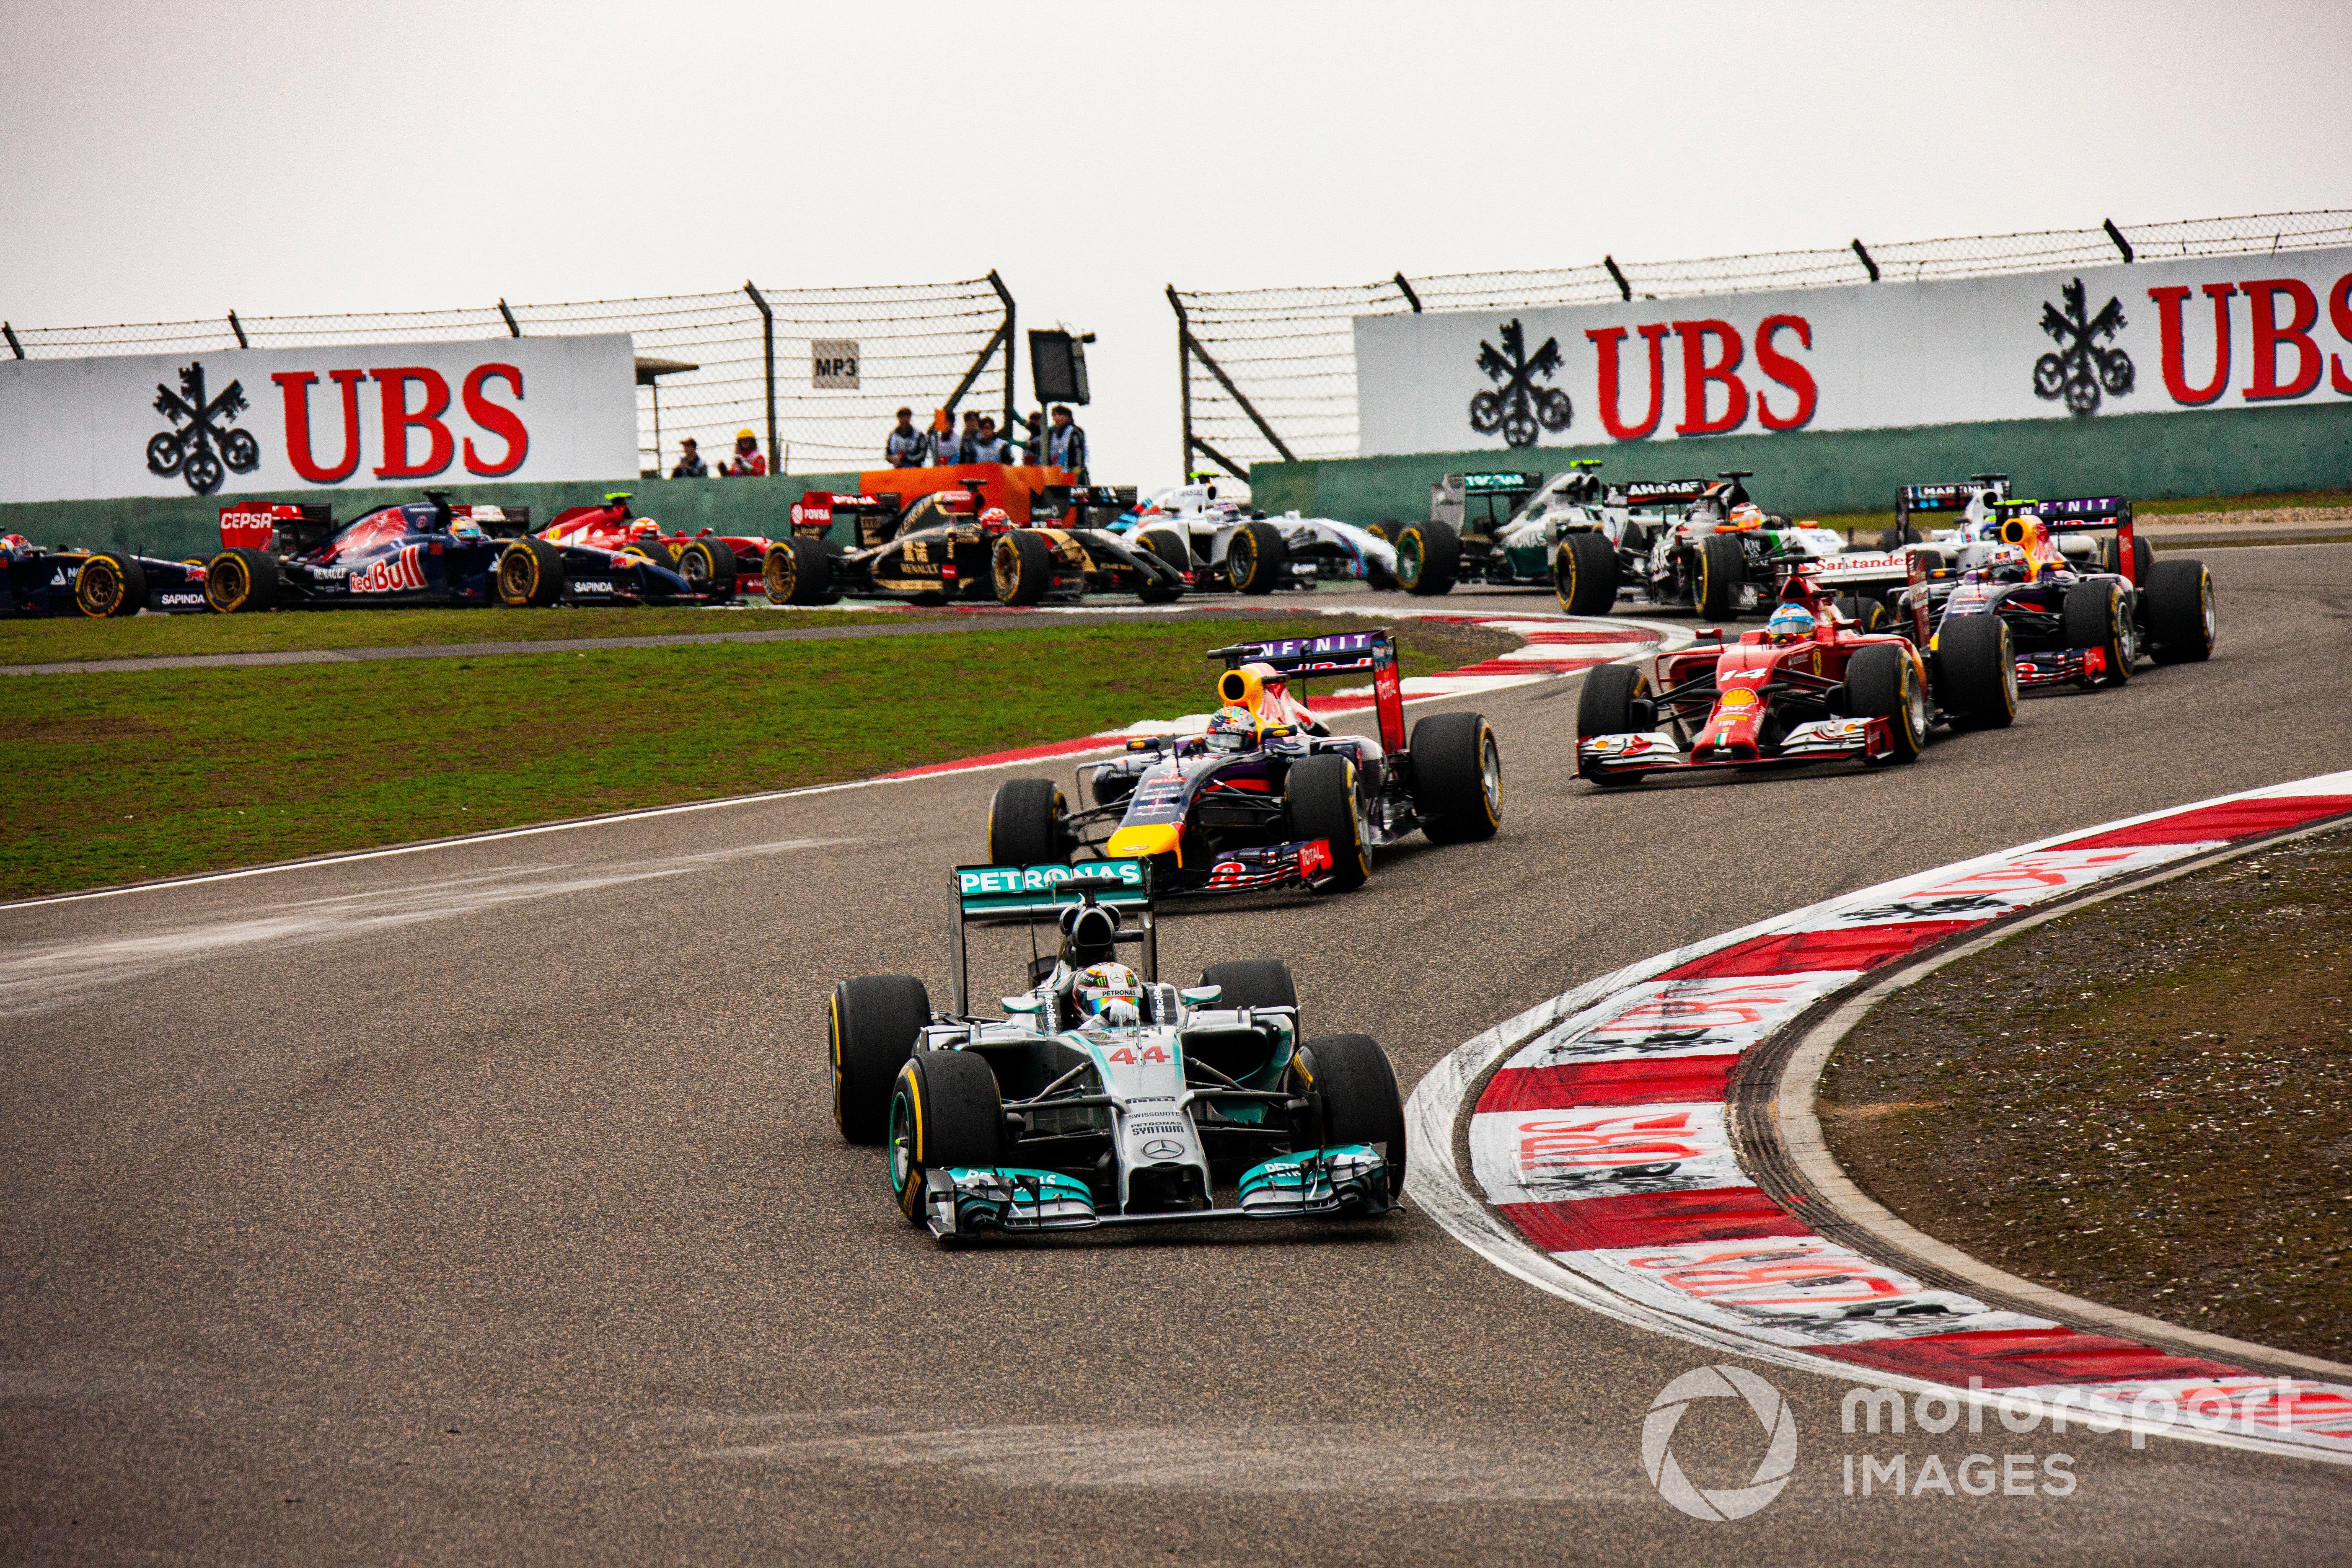 Lewis Hamilton, 2014 Chinese GP